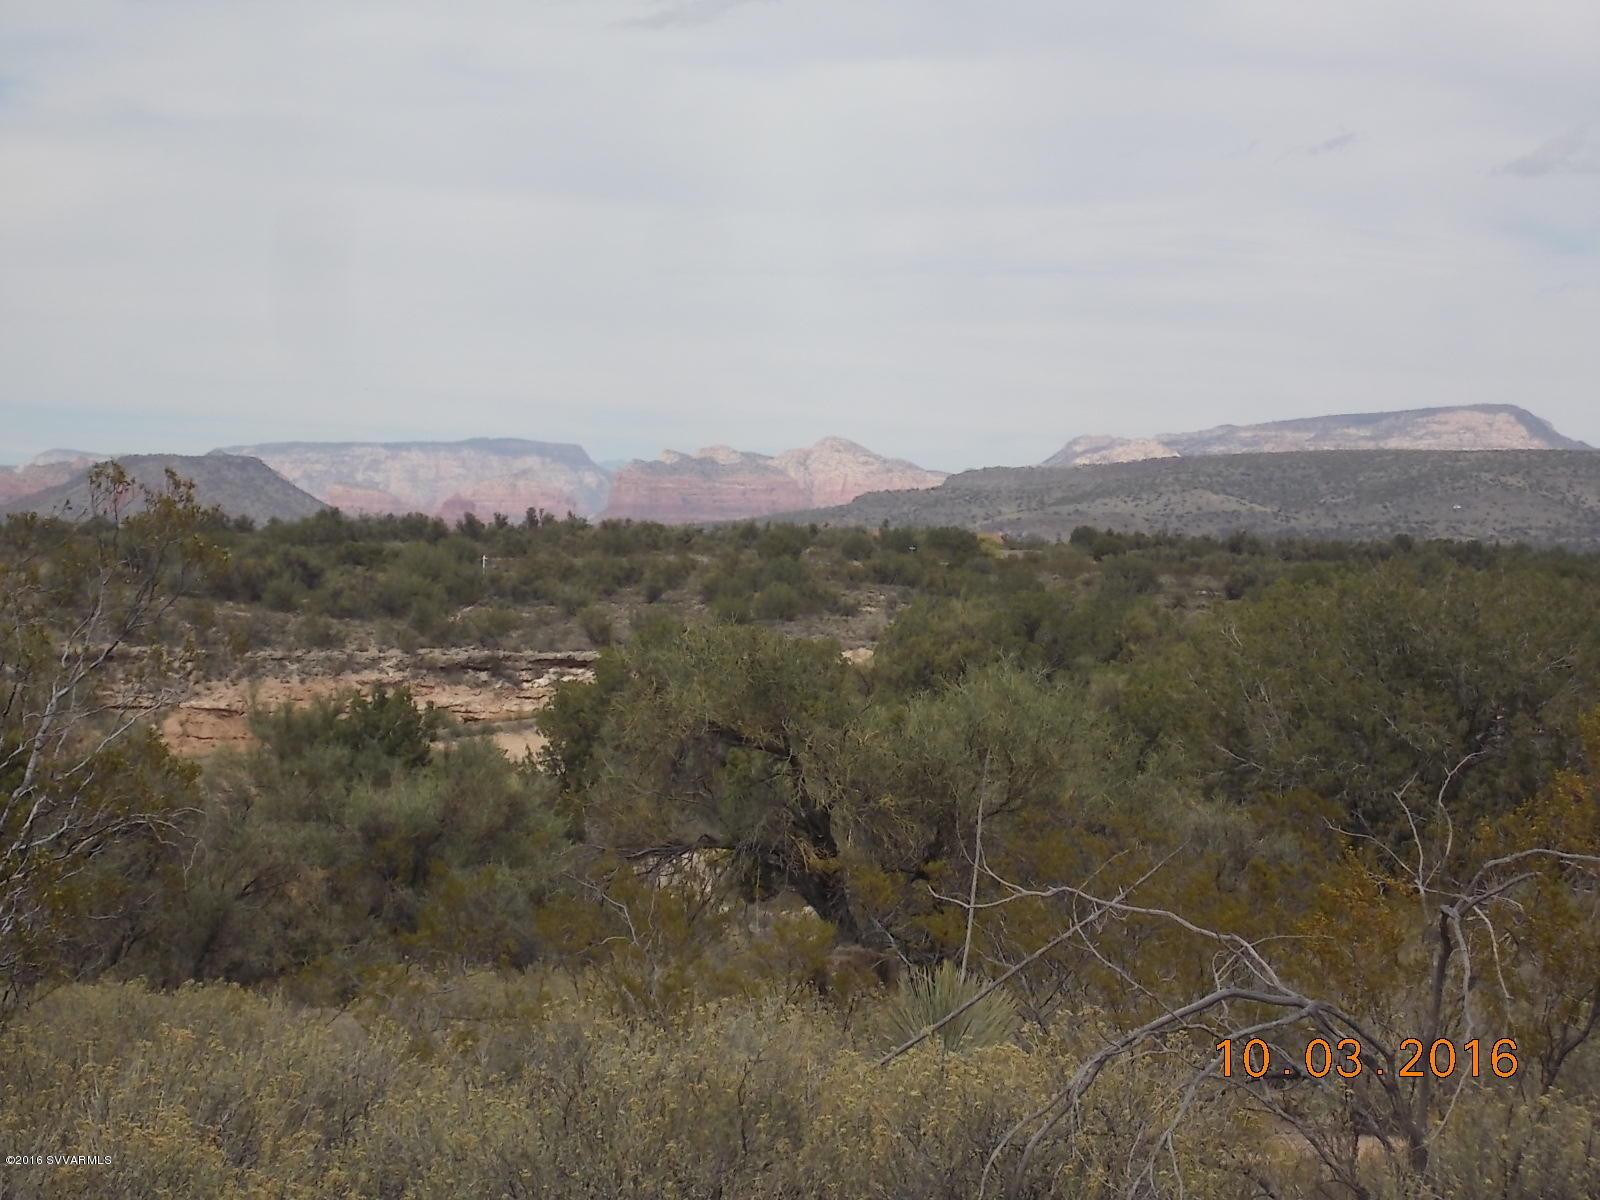 Point Of View Rimrock, AZ 86335